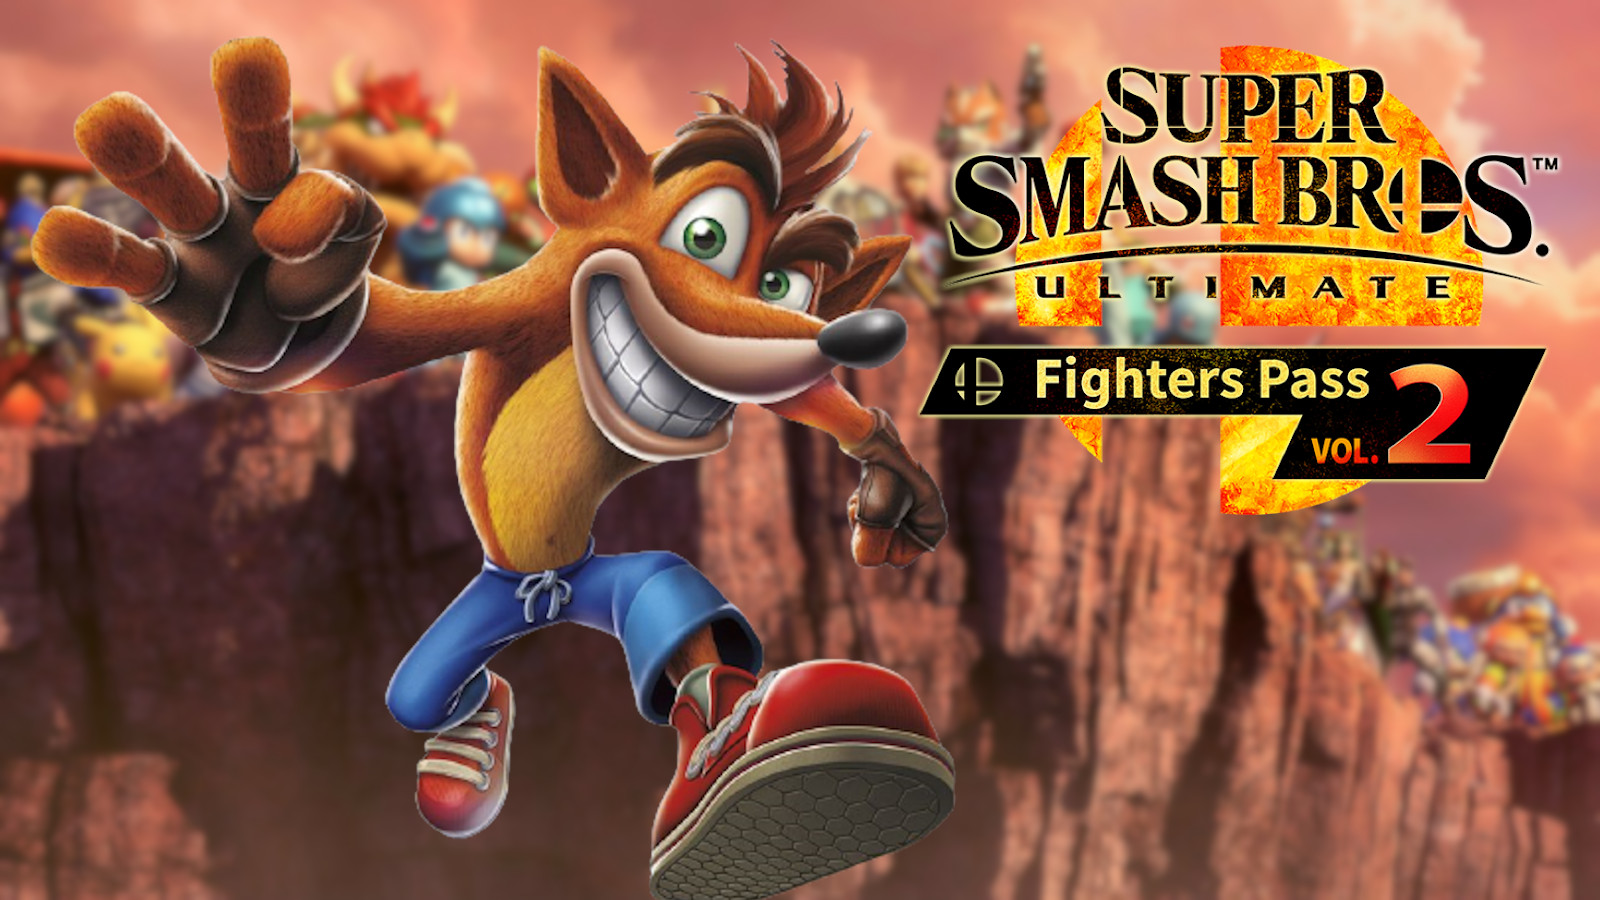 Crash Bandicoot in Smash Ultimate fighters pass volume 2